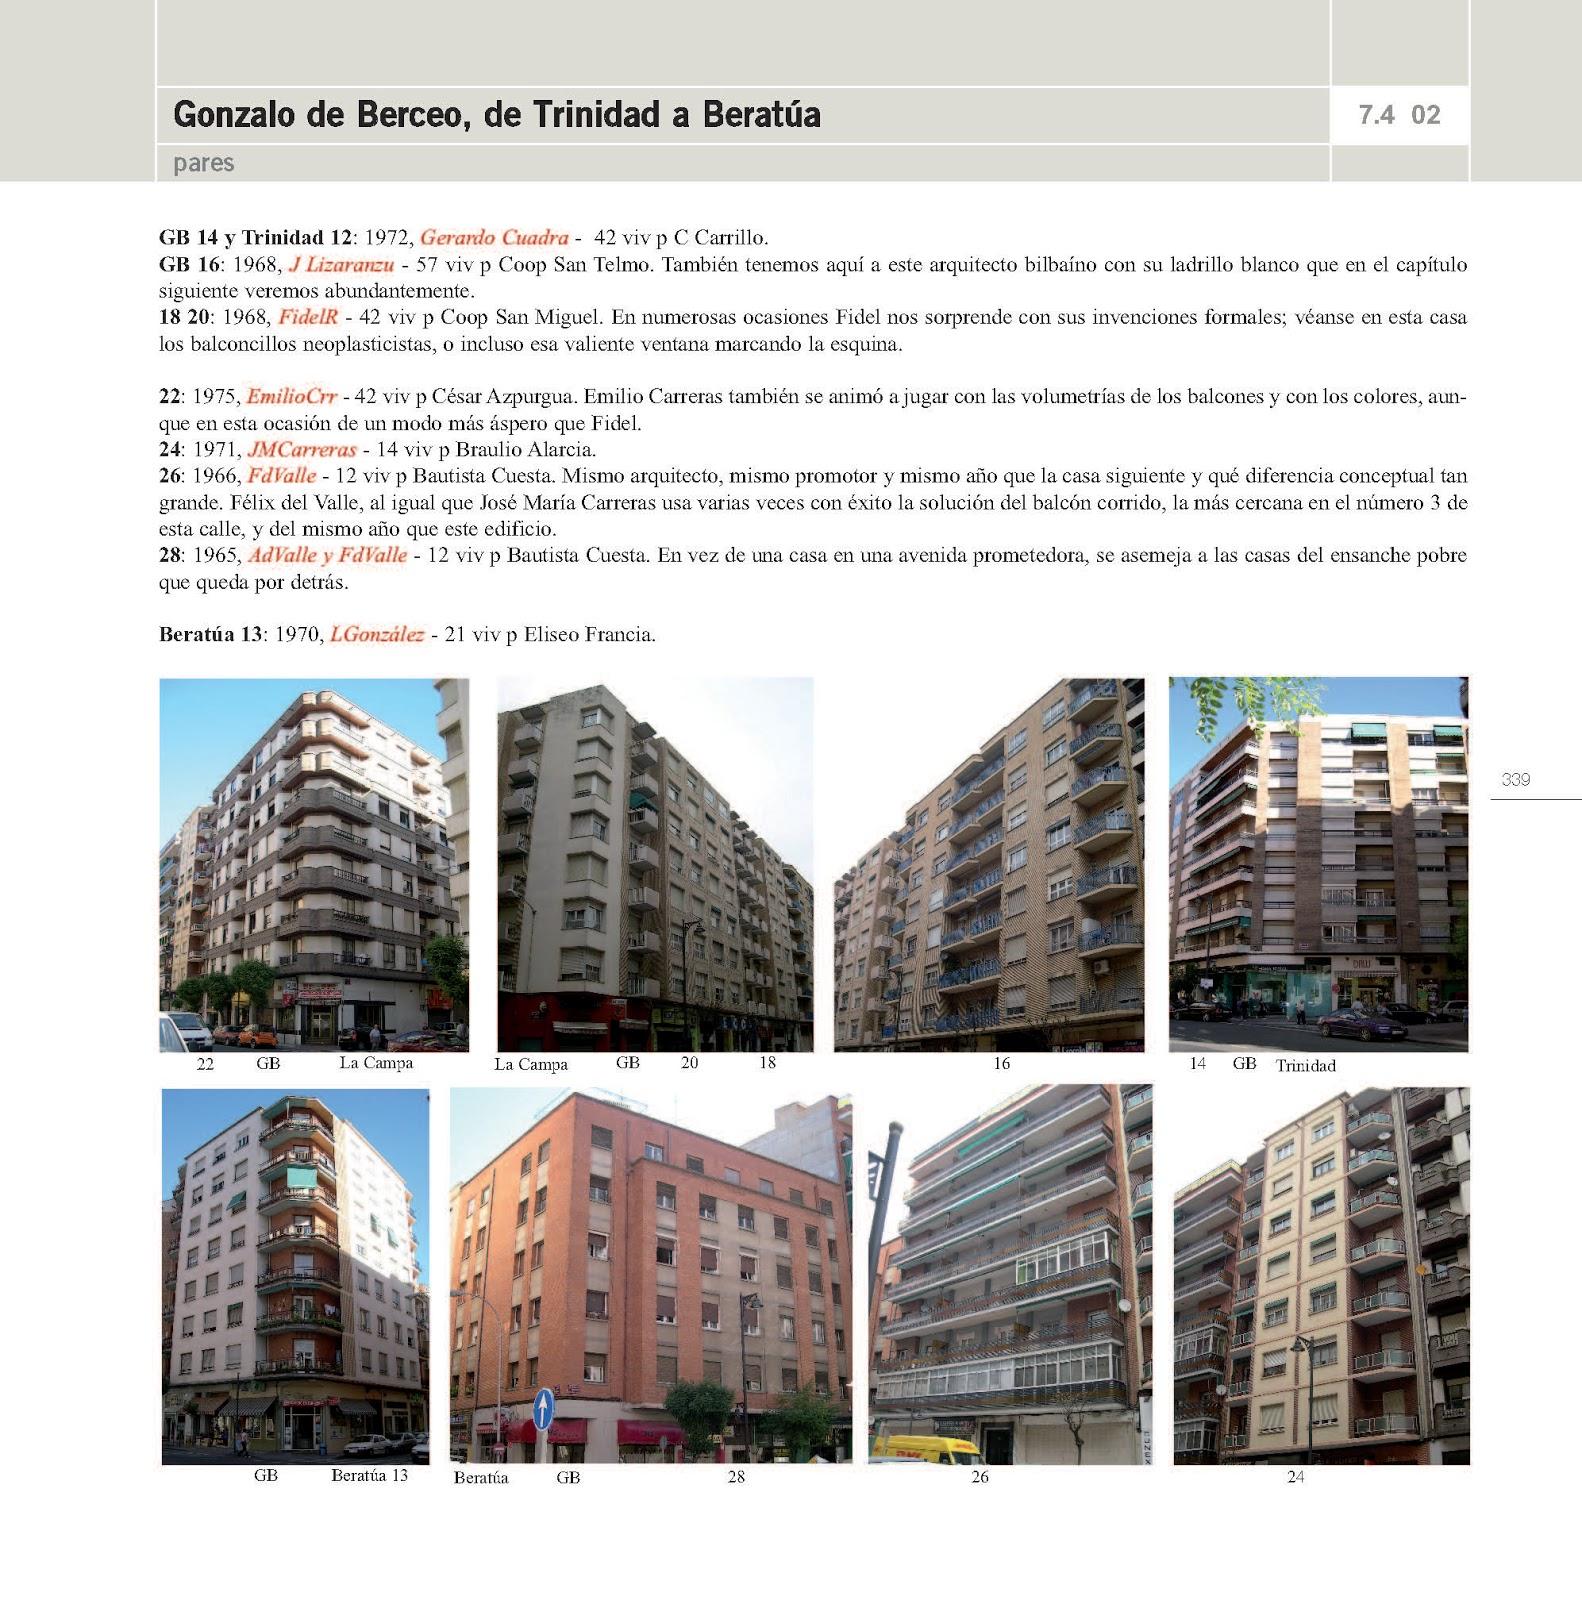 Guia de arquitectura de logro o paginas 7 4 02 gonzalo for Paginas arquitectura